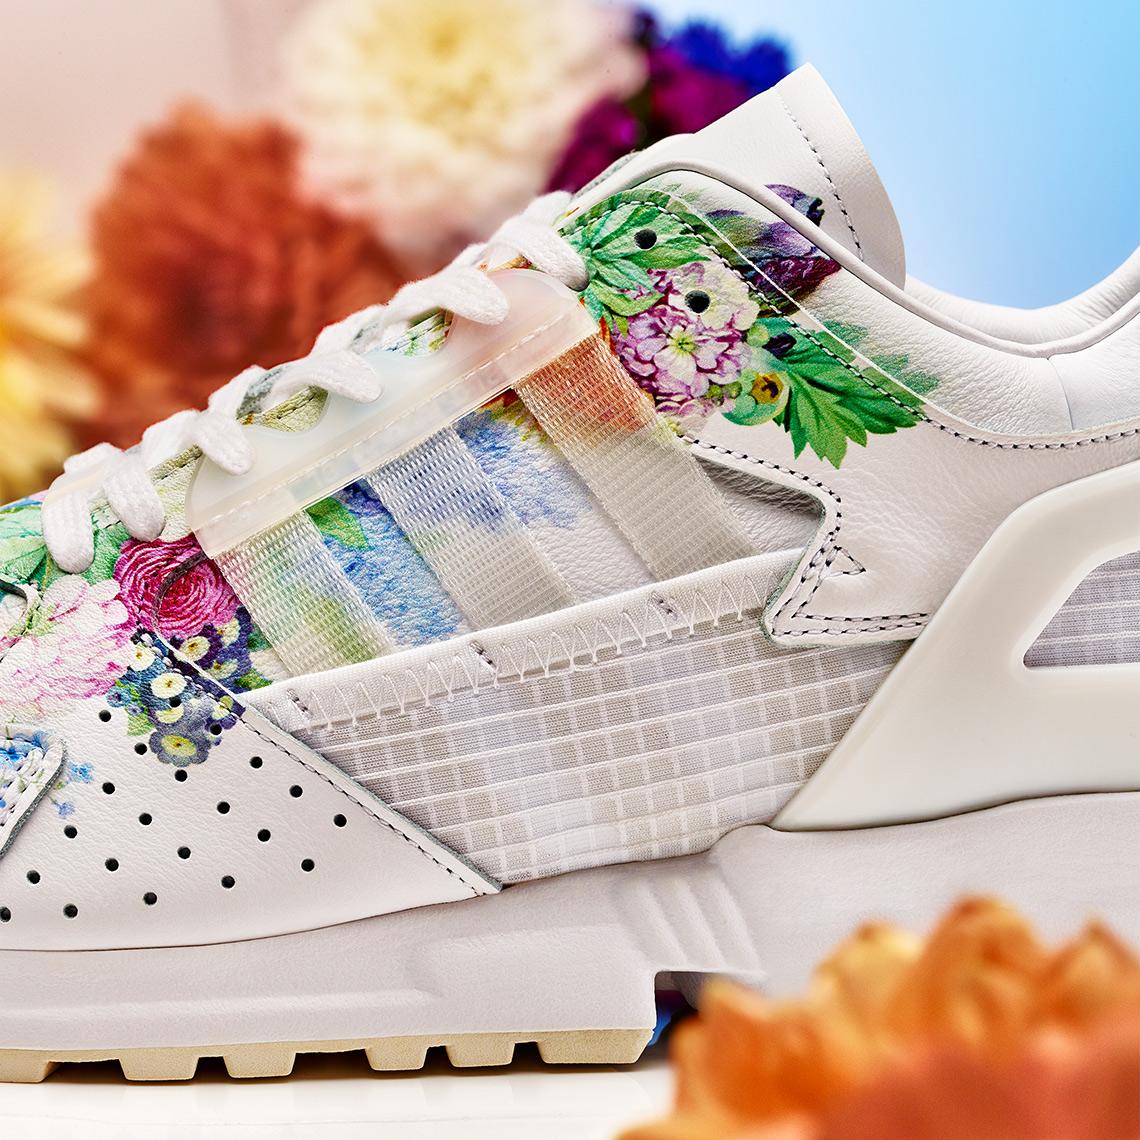 meissen-adidas-zx10000c-FZ4888-release-date-3.jpg?w=1140